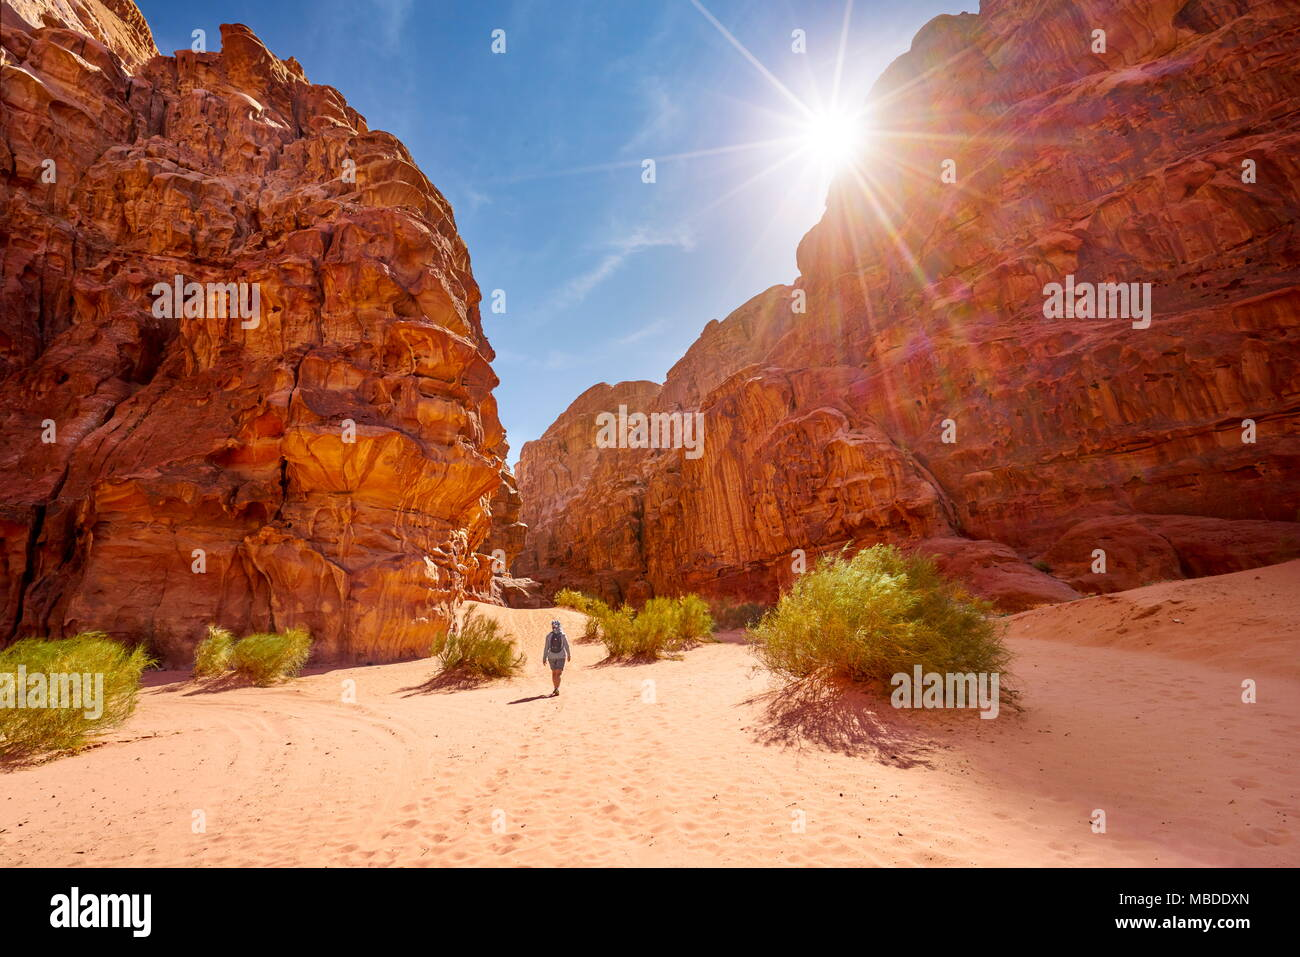 Trekking in Wadi Rum Desert, Jordan Stock Photo